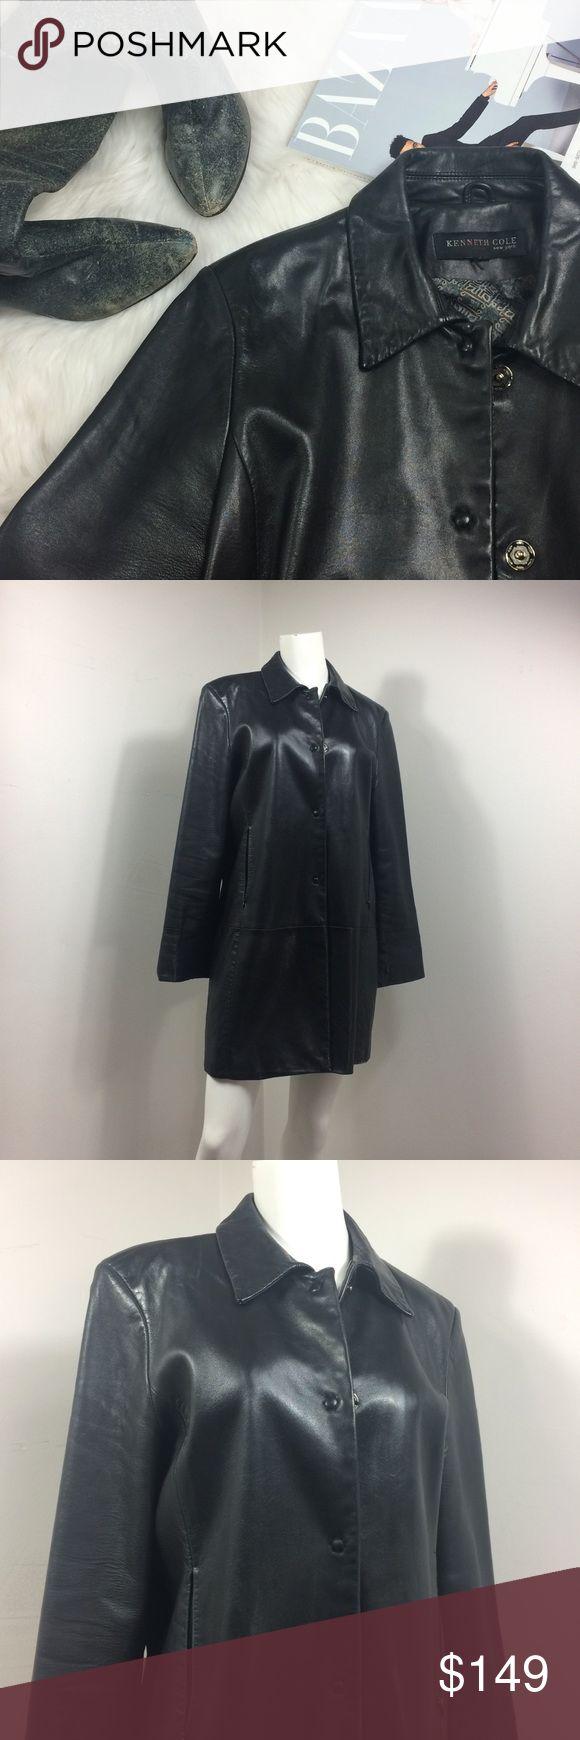 Michael Kors Anita Set   Fashion, Clothes design, Fashion